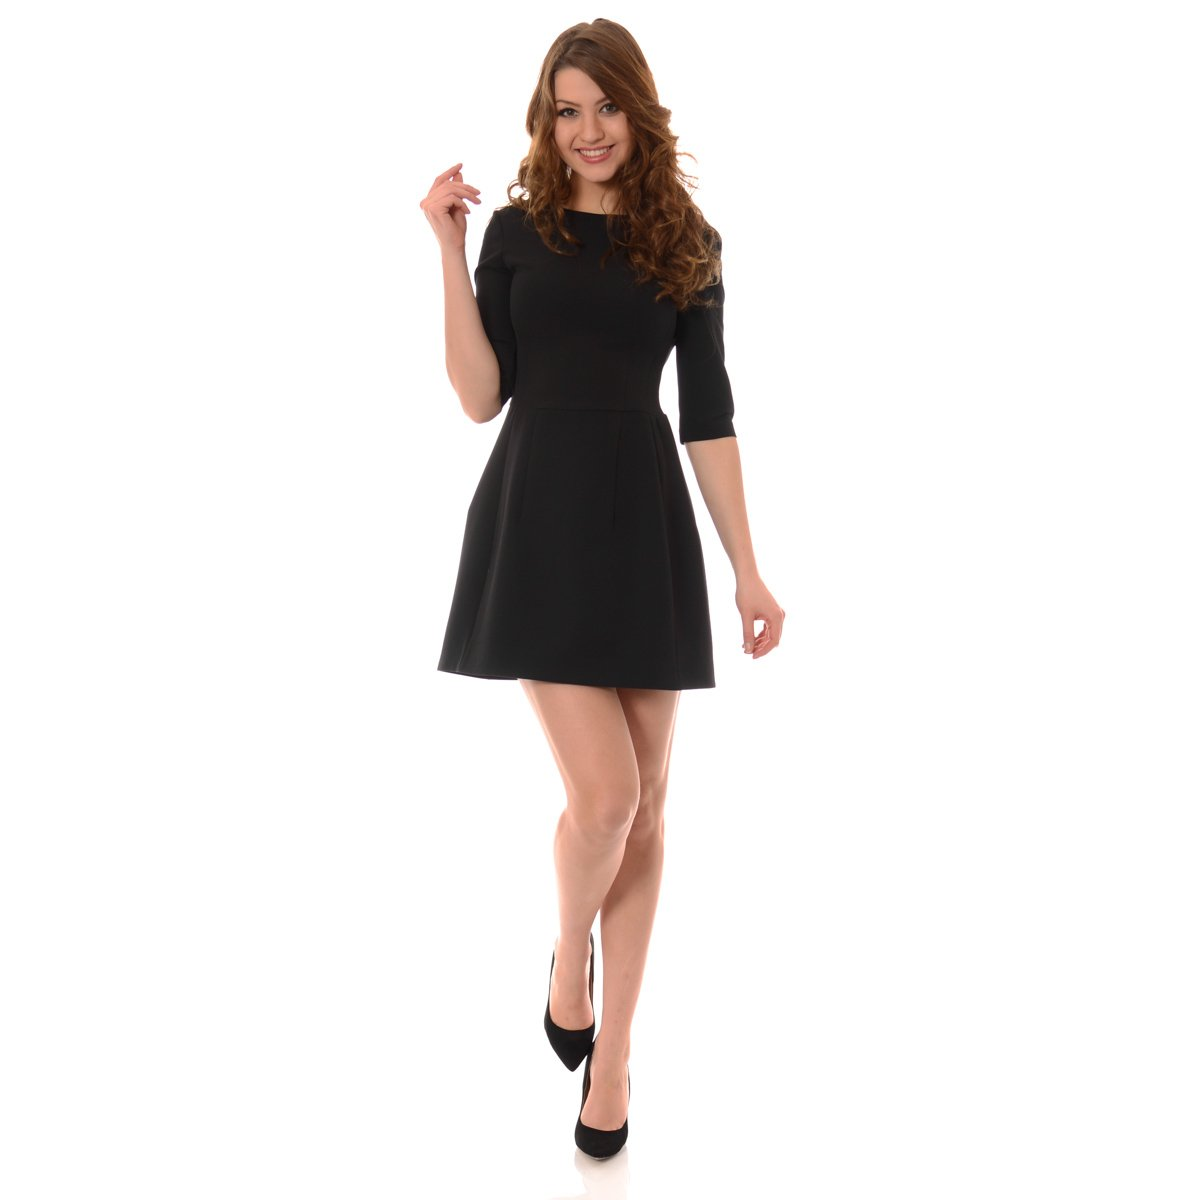 38d16c4e Mała Czarna Rozkloszowana Tonia Sukienka